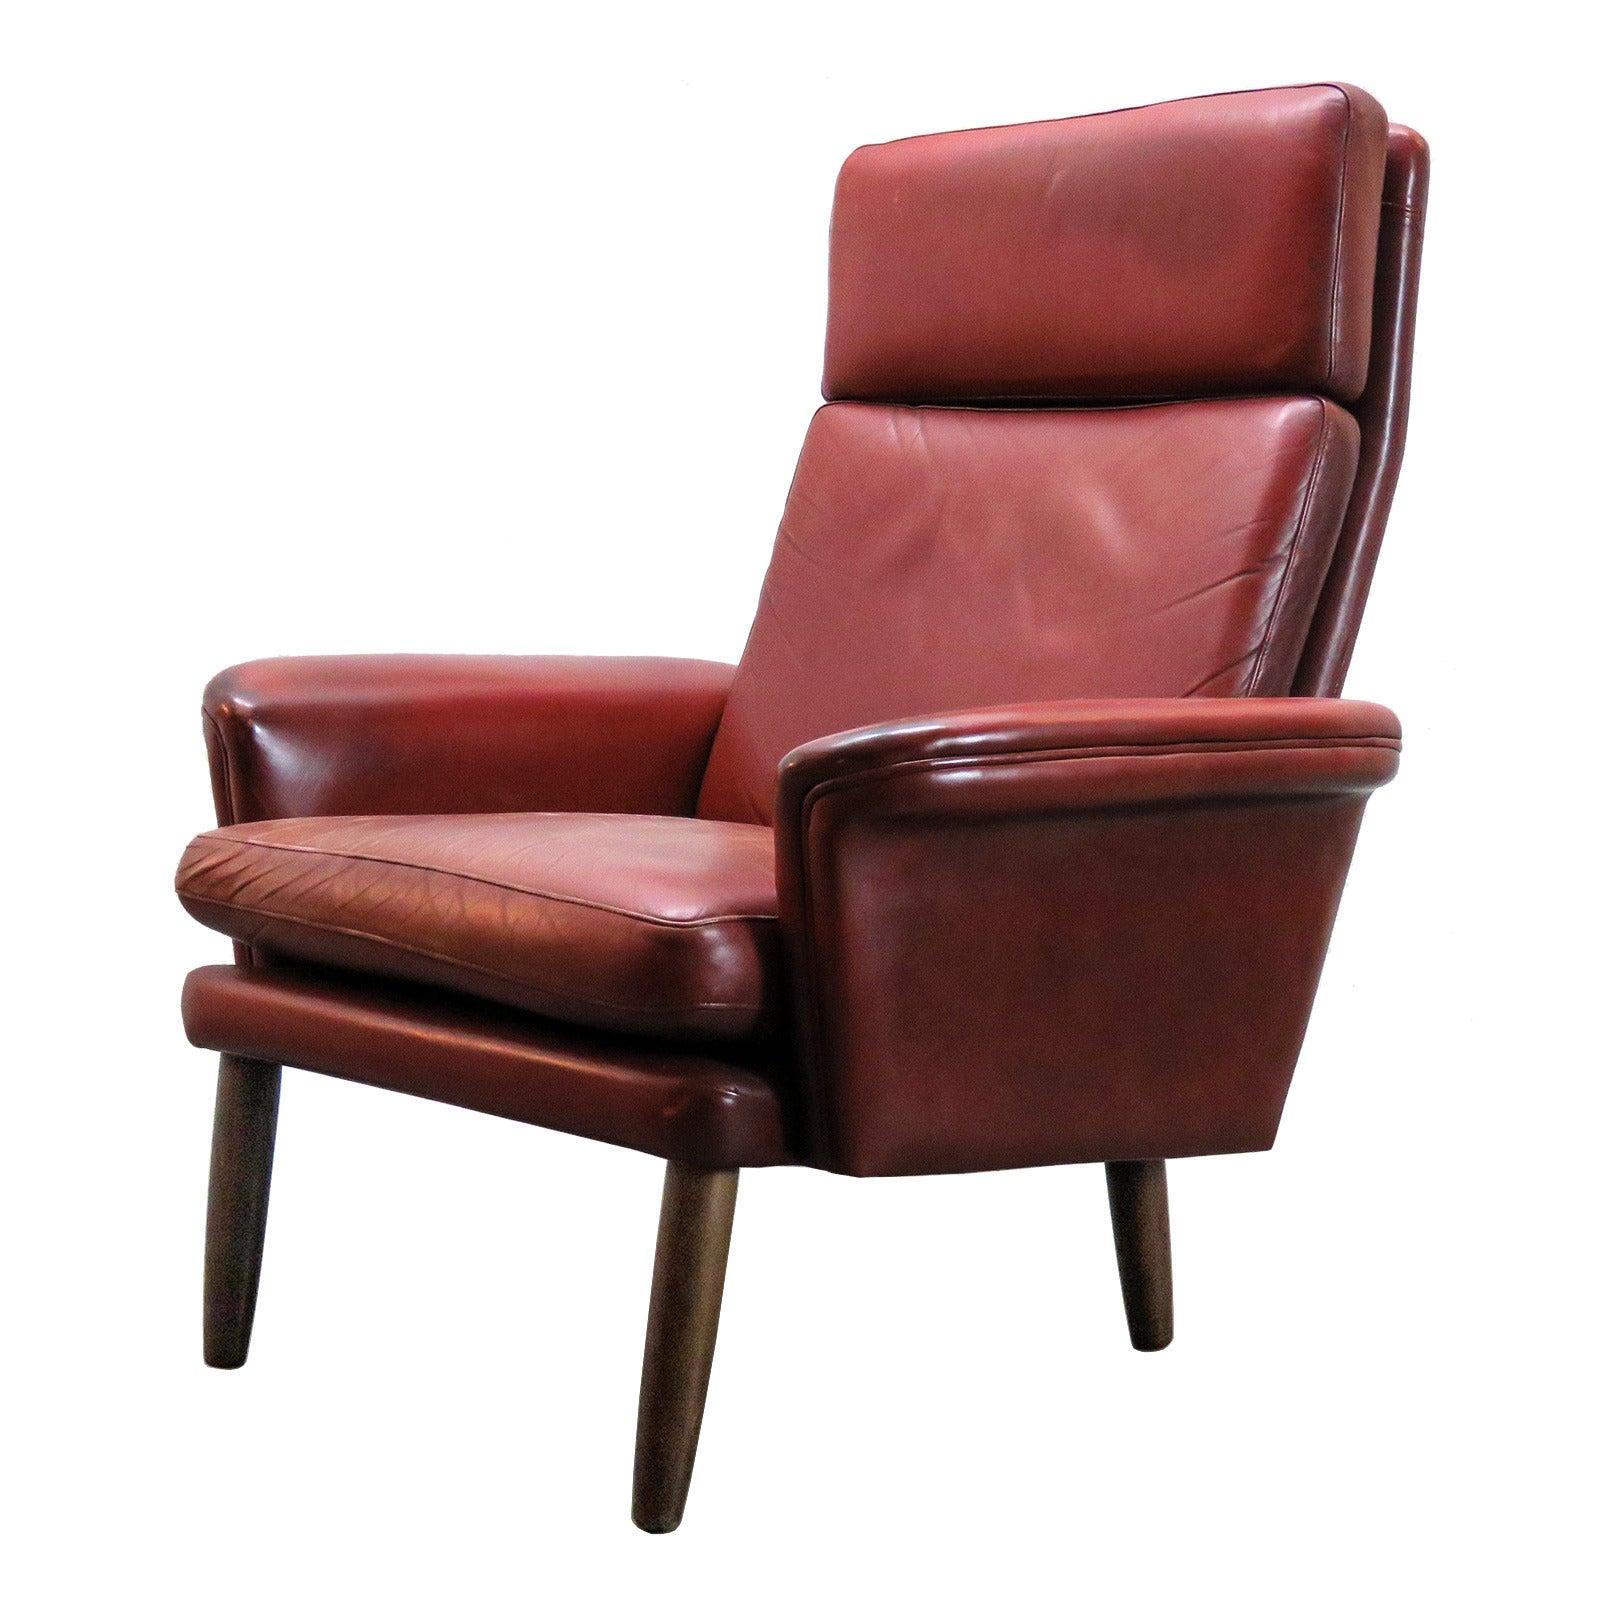 Danish High Back Leather Lounge Chair